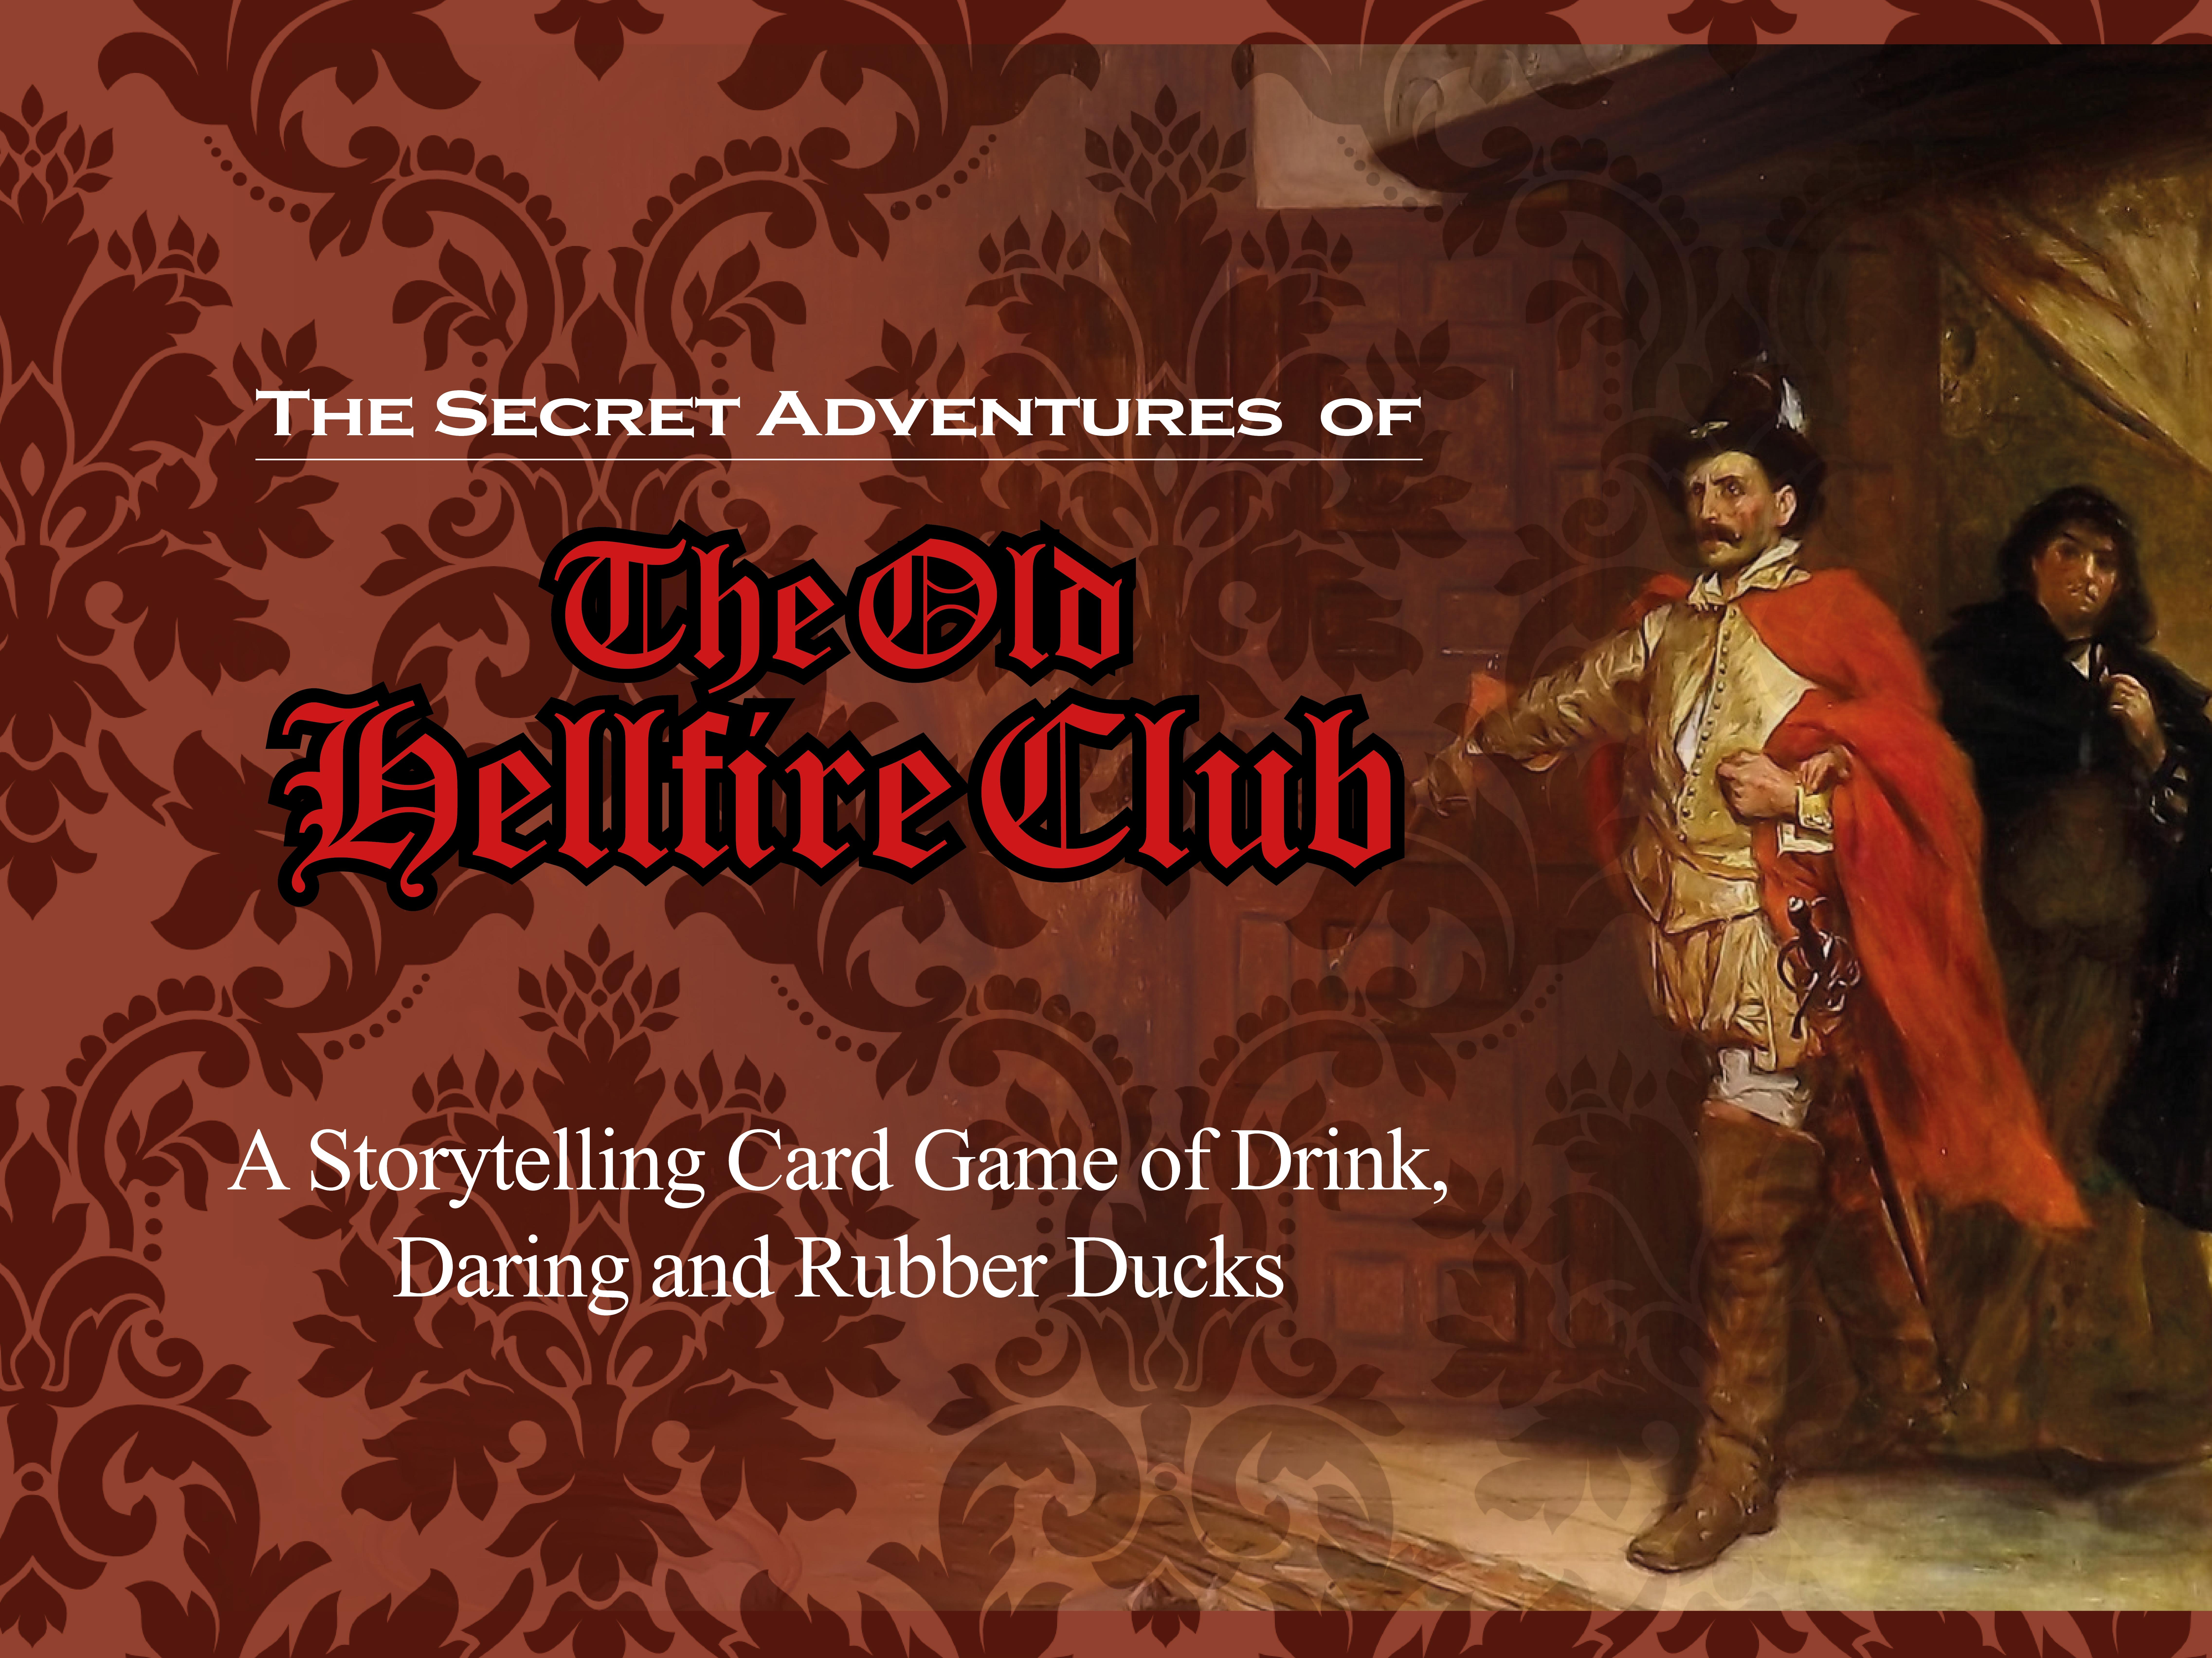 The Old Hellfire Club